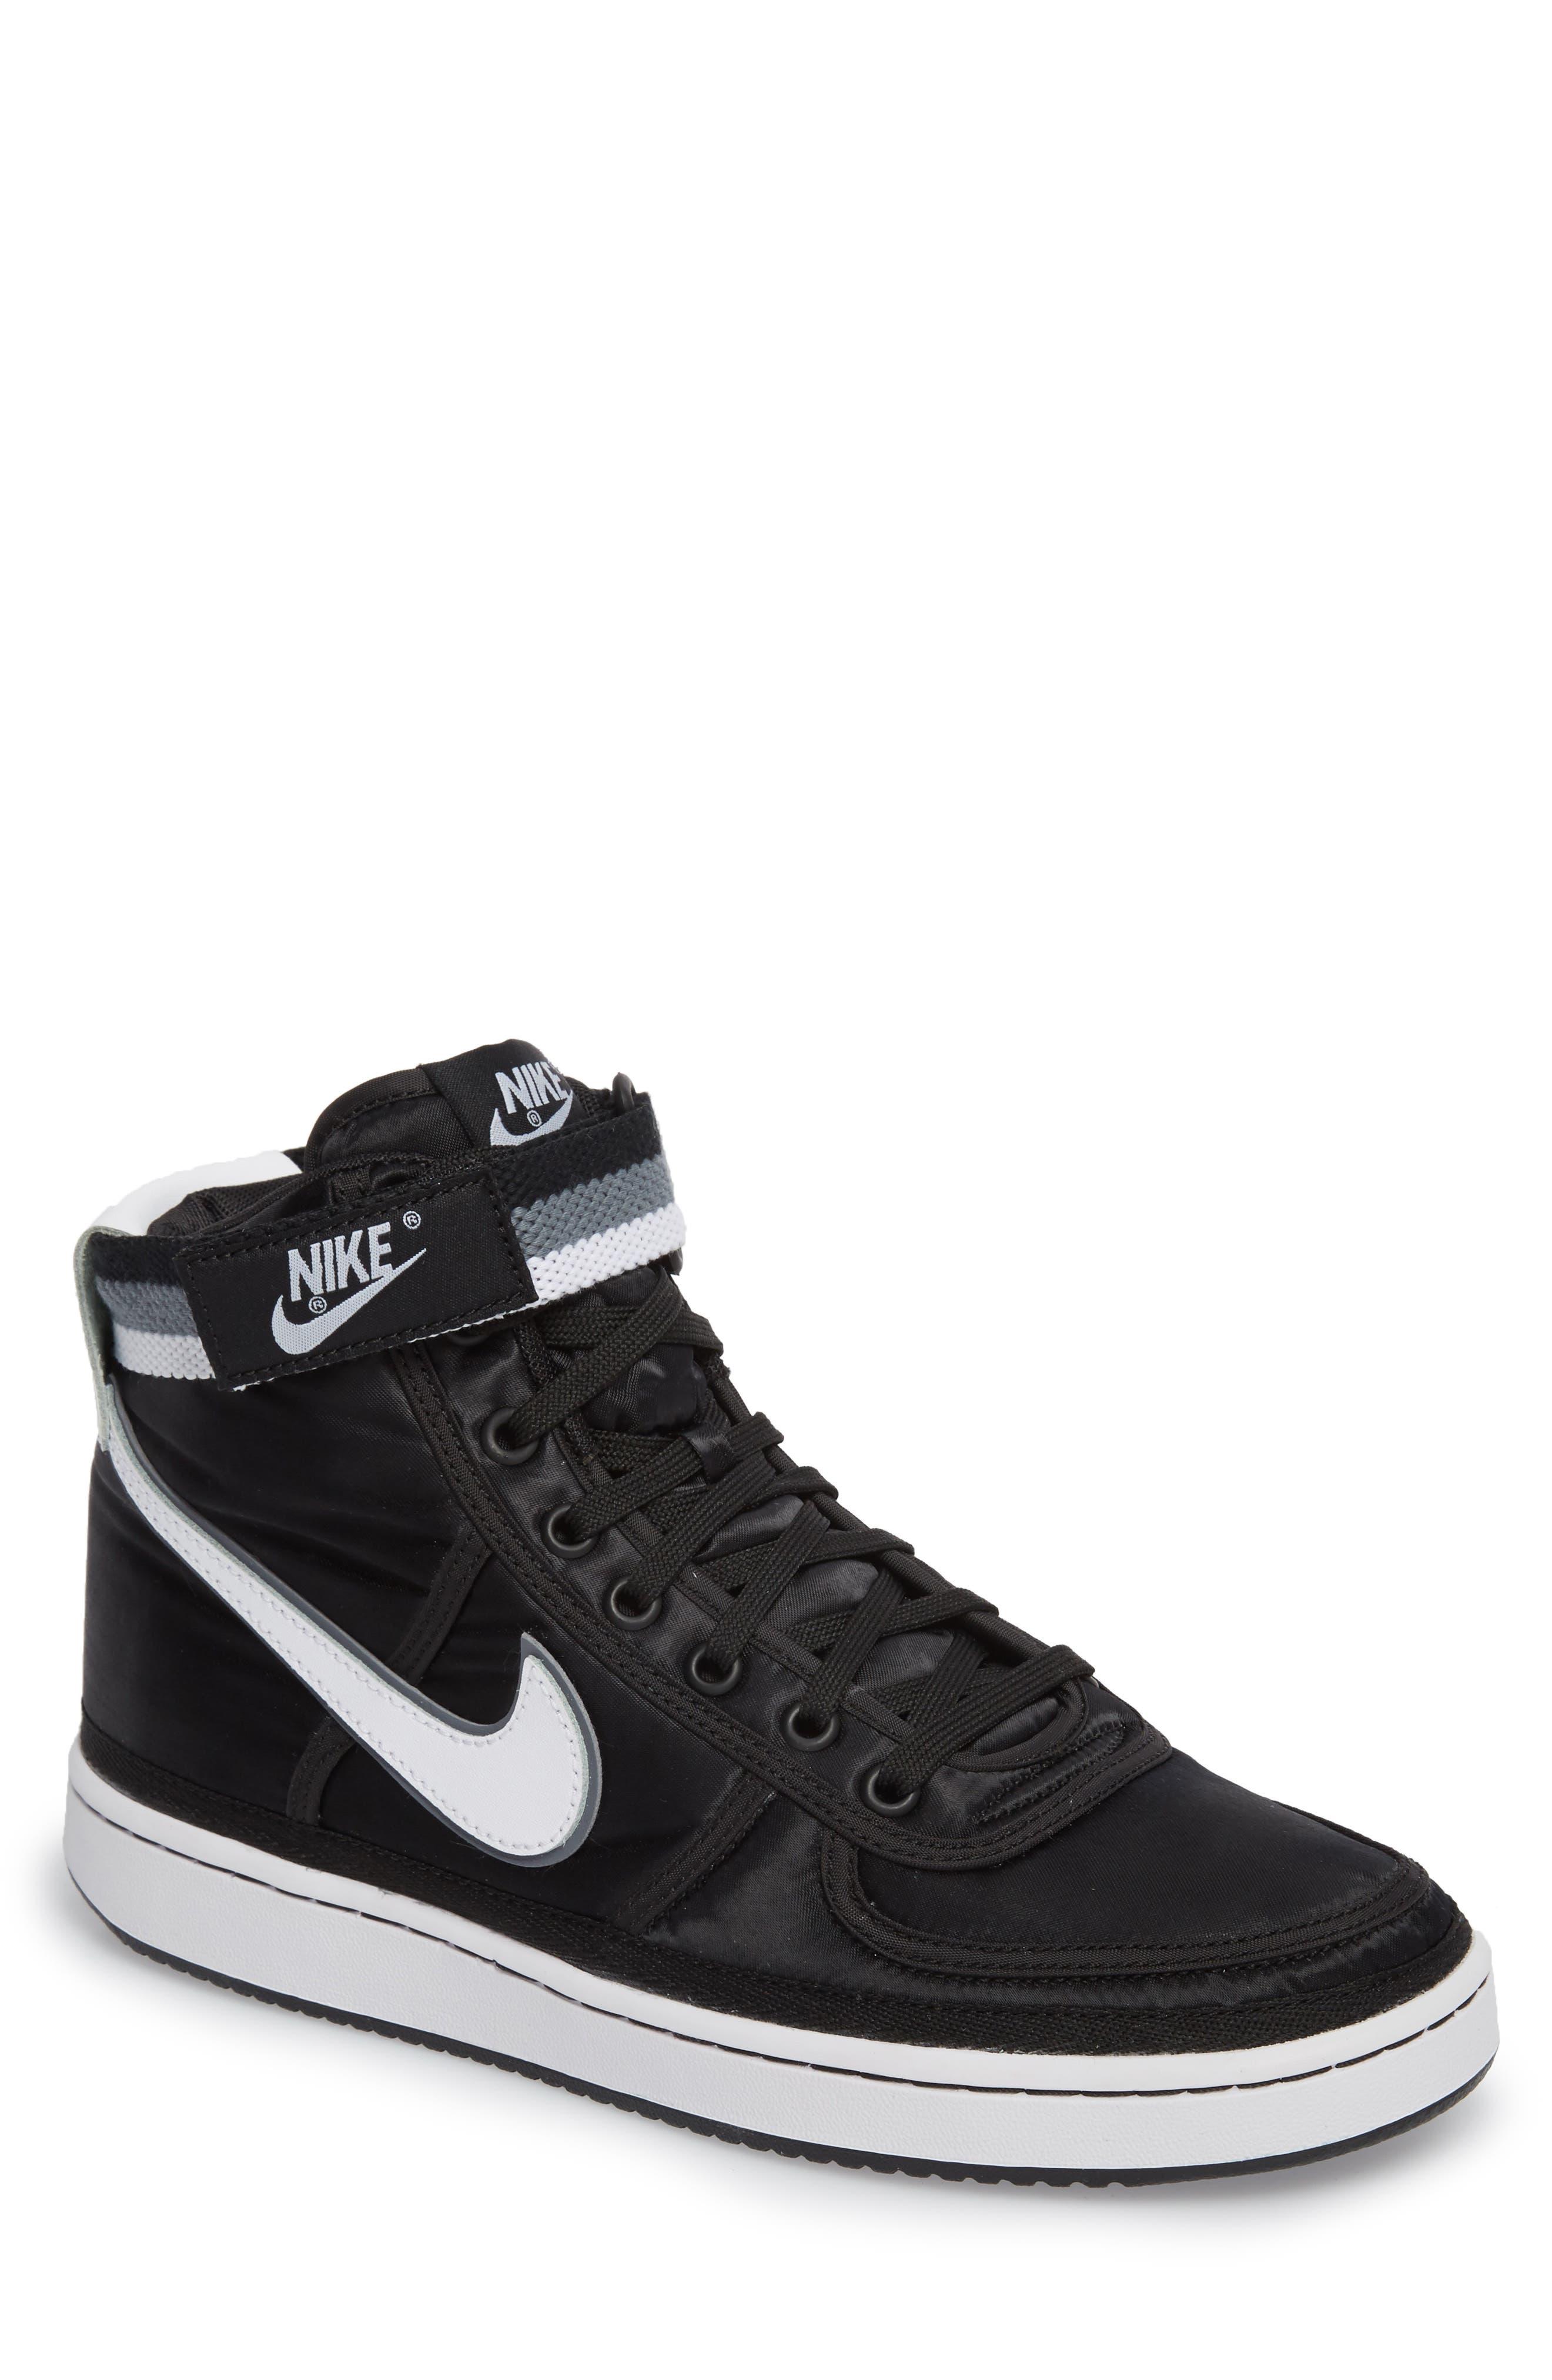 Nike Vandal High Supreme High Top